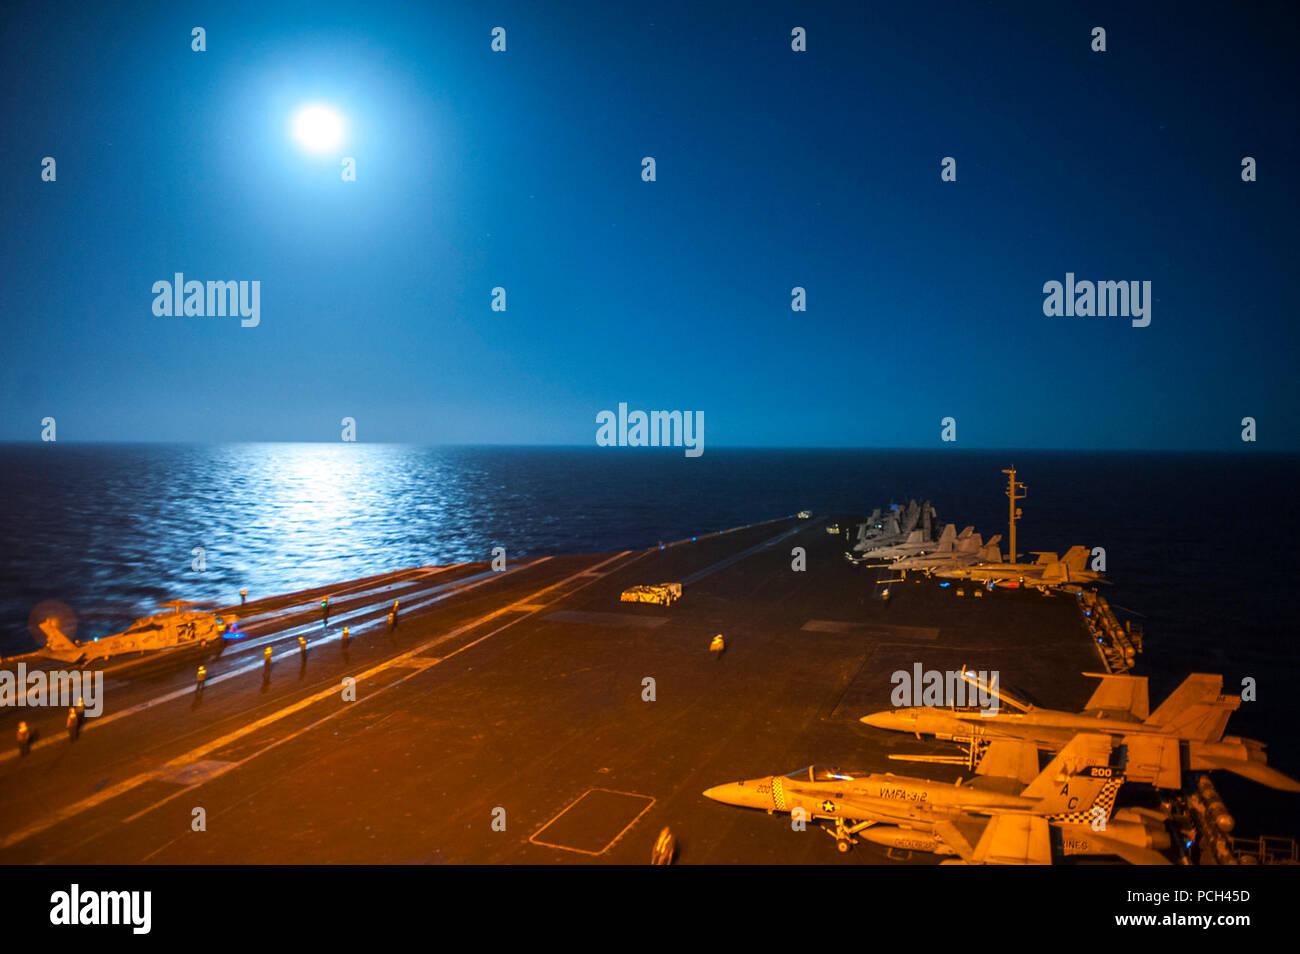 002 75 Stock Photos & 002 75 Stock Images - Alamy